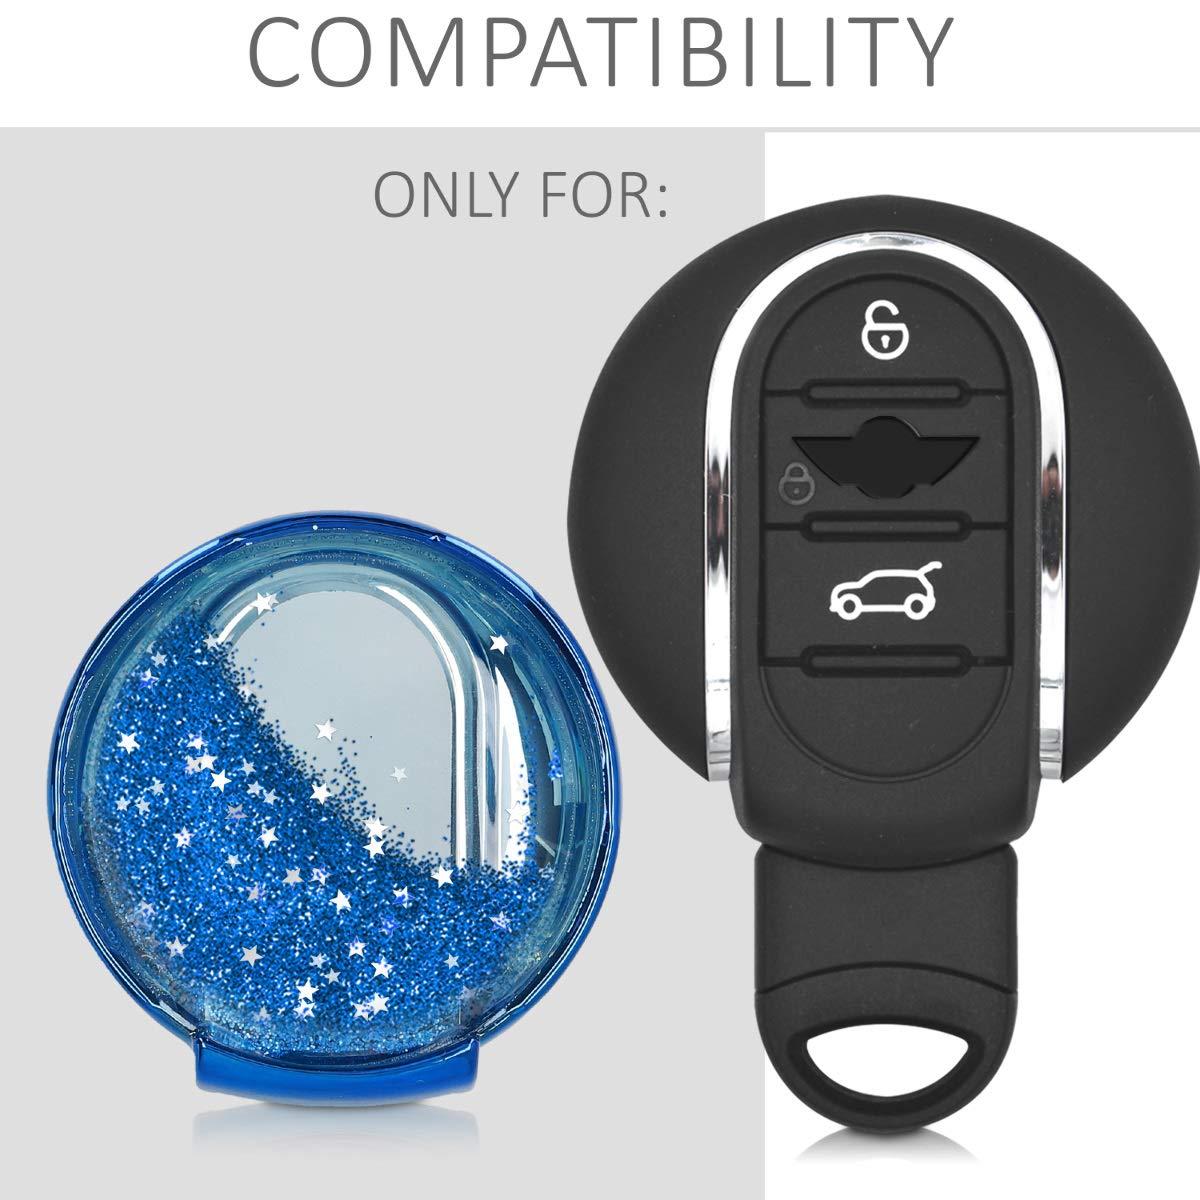 Silver//Metallic Silver kwmobile Car Key Cover for Mini Soft TPU Silicone Protective Key Fob Cover for Mini 3 Button Car Key Smart Key